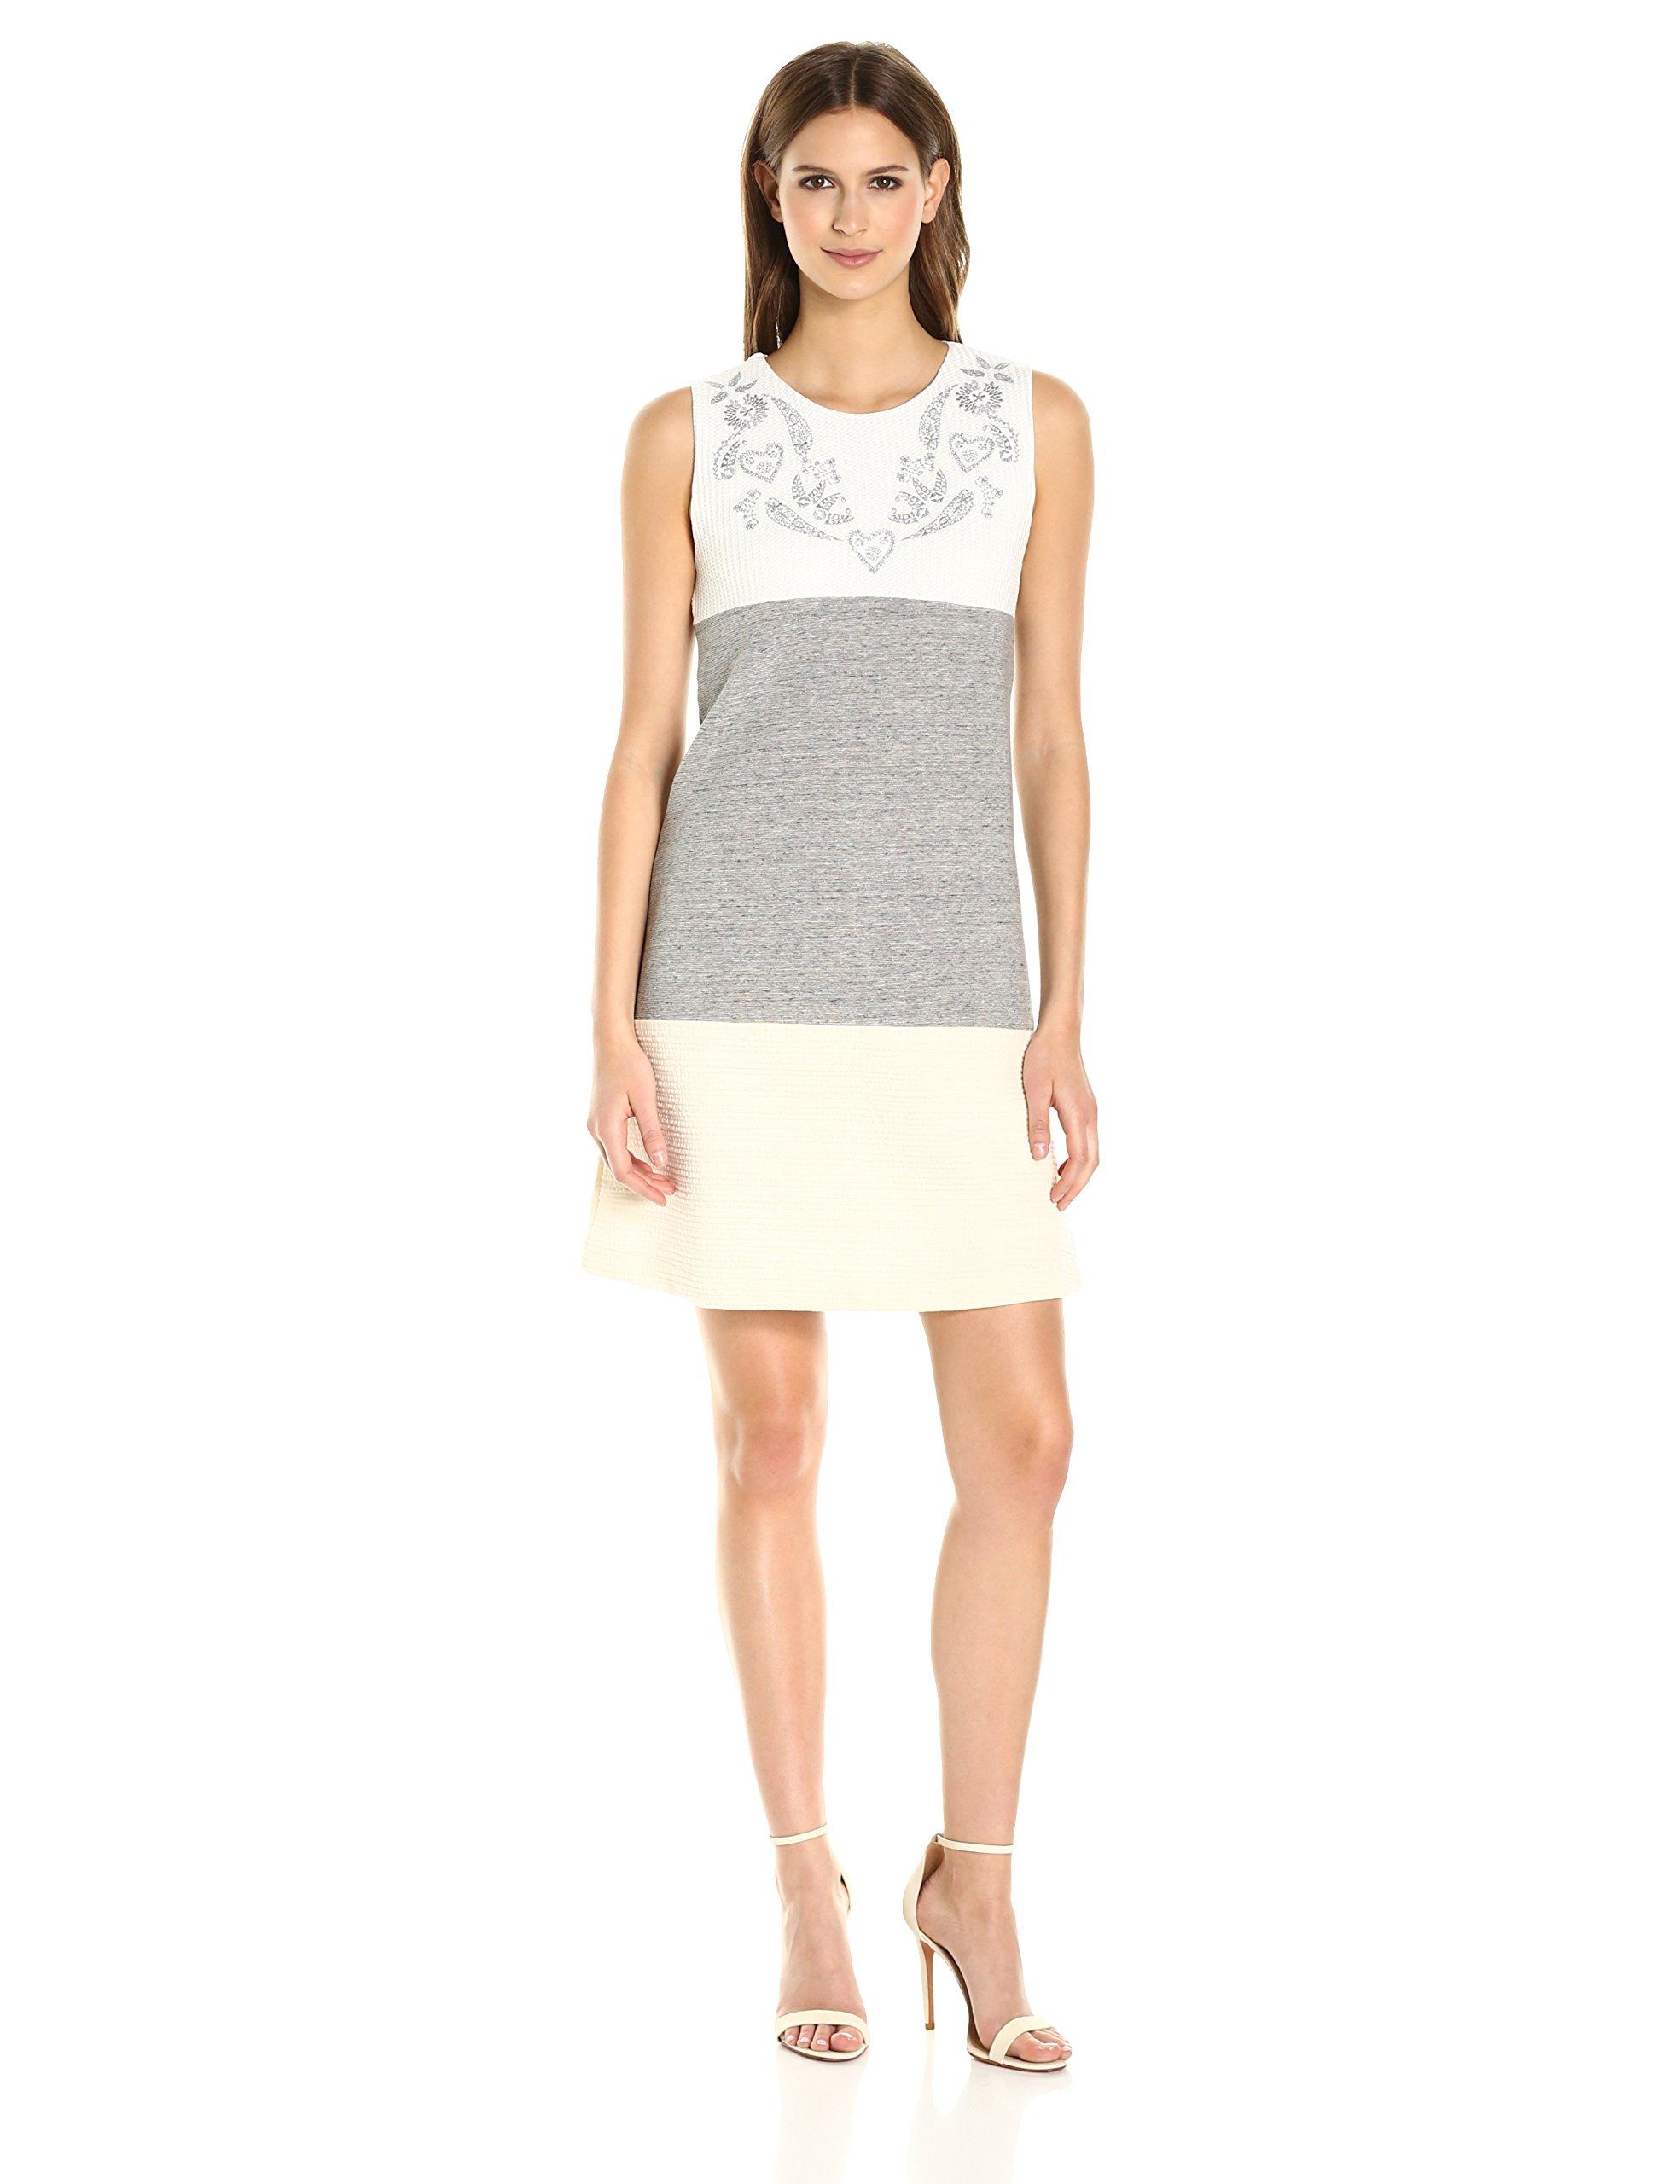 Desigual Women's Colorado Knitted Sleeveless Dress, Vigore Claro, S